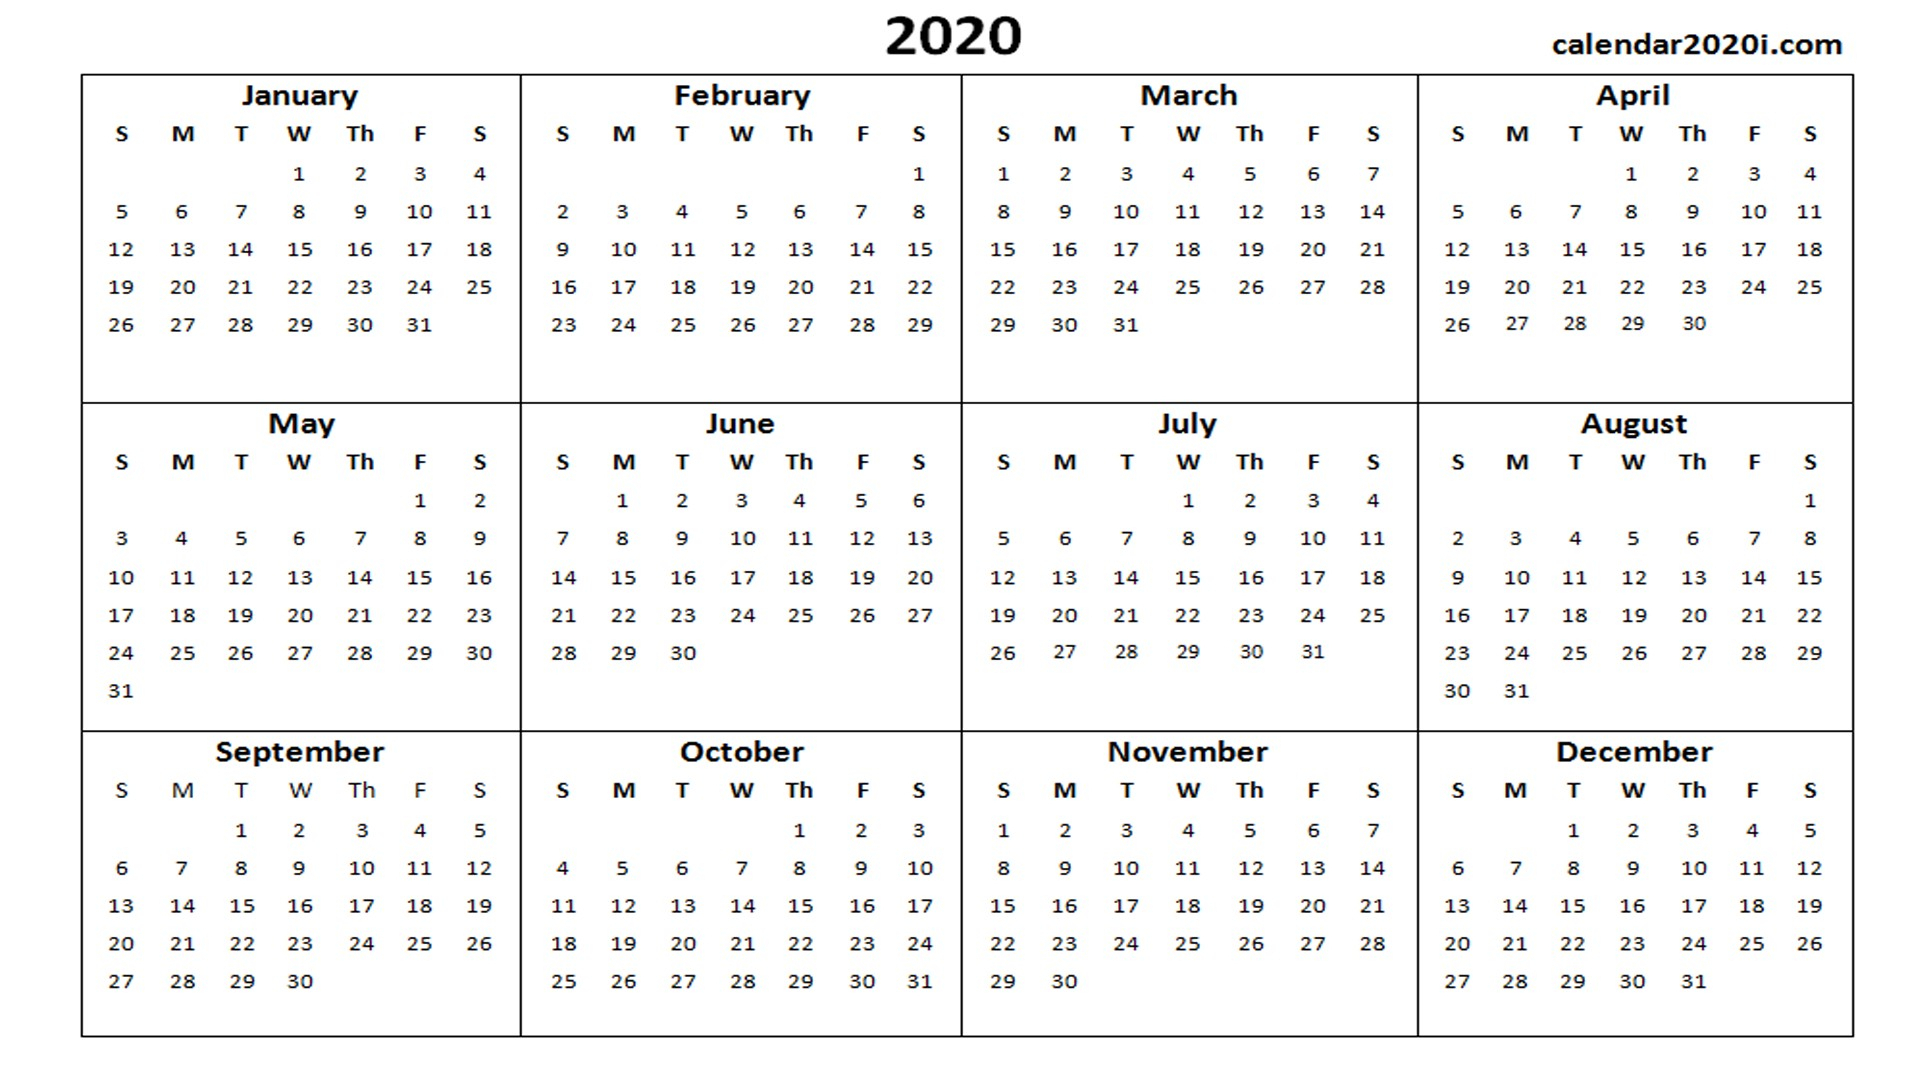 2020 Printable Calendar Template 2020 Calendar Printable Template within Word Calendar Template Excel